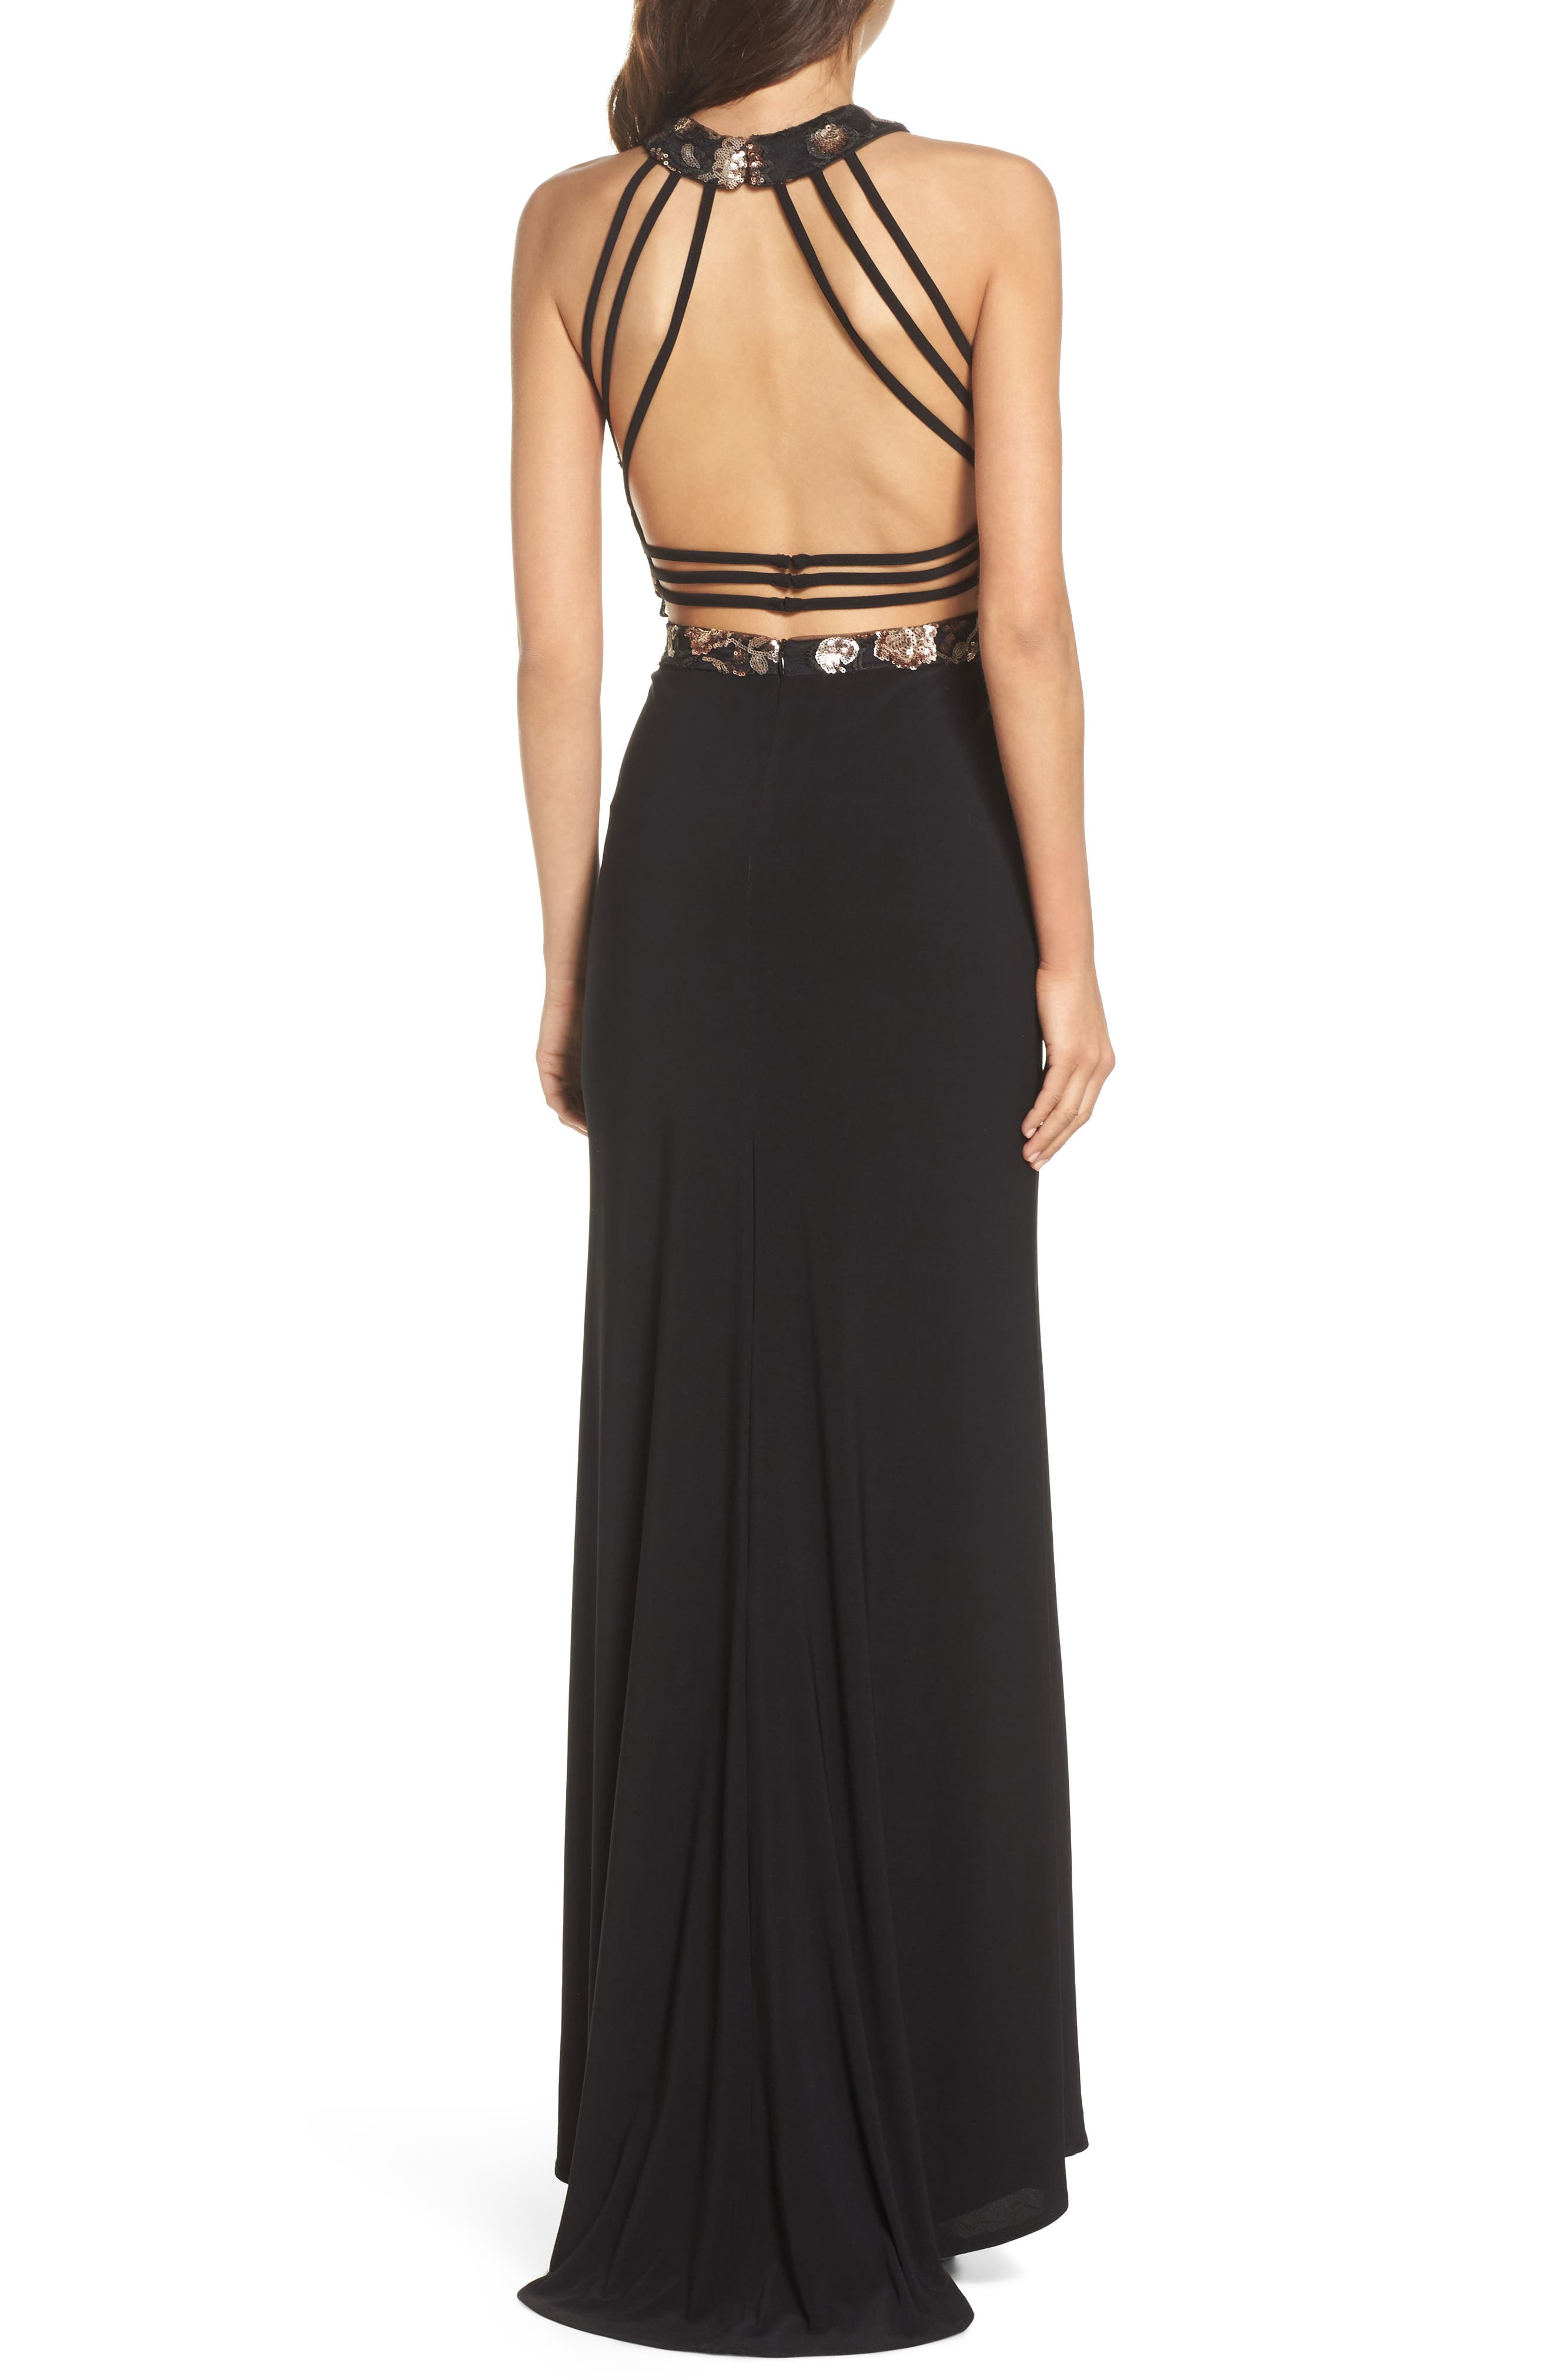 MORGAN & CO.,                             Sequin Mesh Panel Gown,                             Alternate thumbnail 2, color,                             BLACK / ROSE GOLD